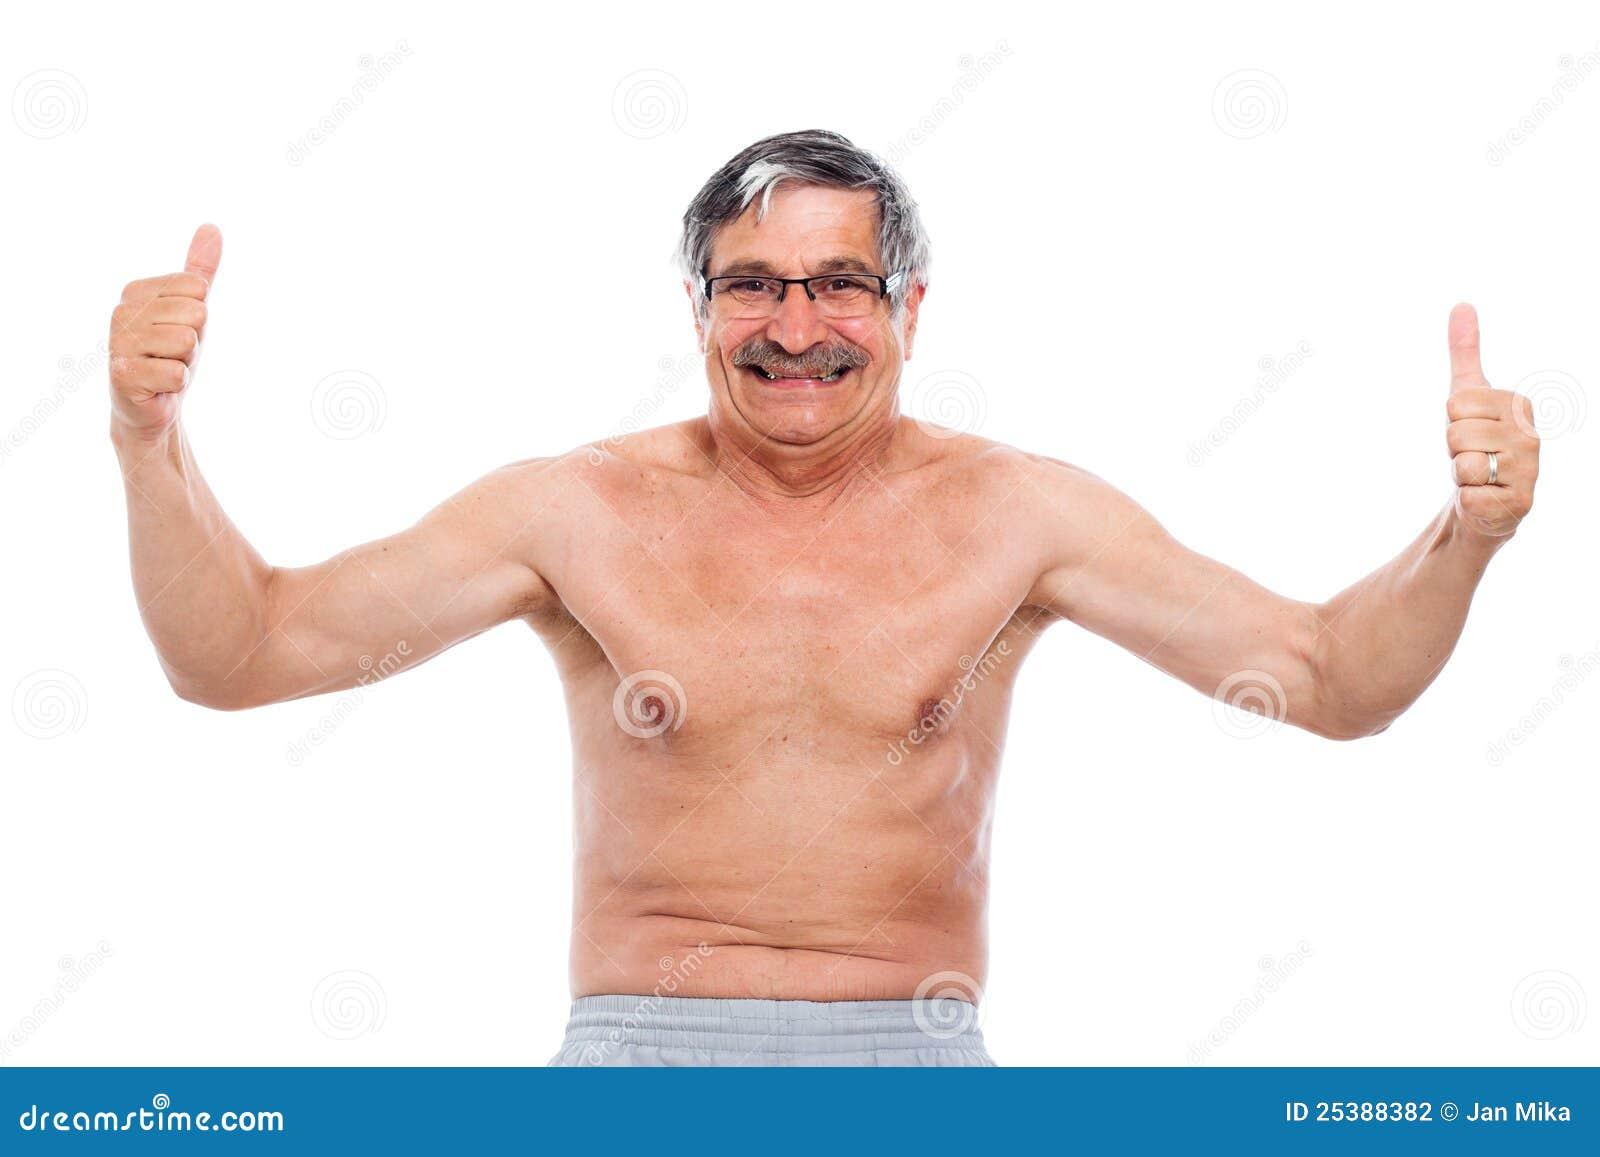 happy-senior-man-showing-his-body-253883